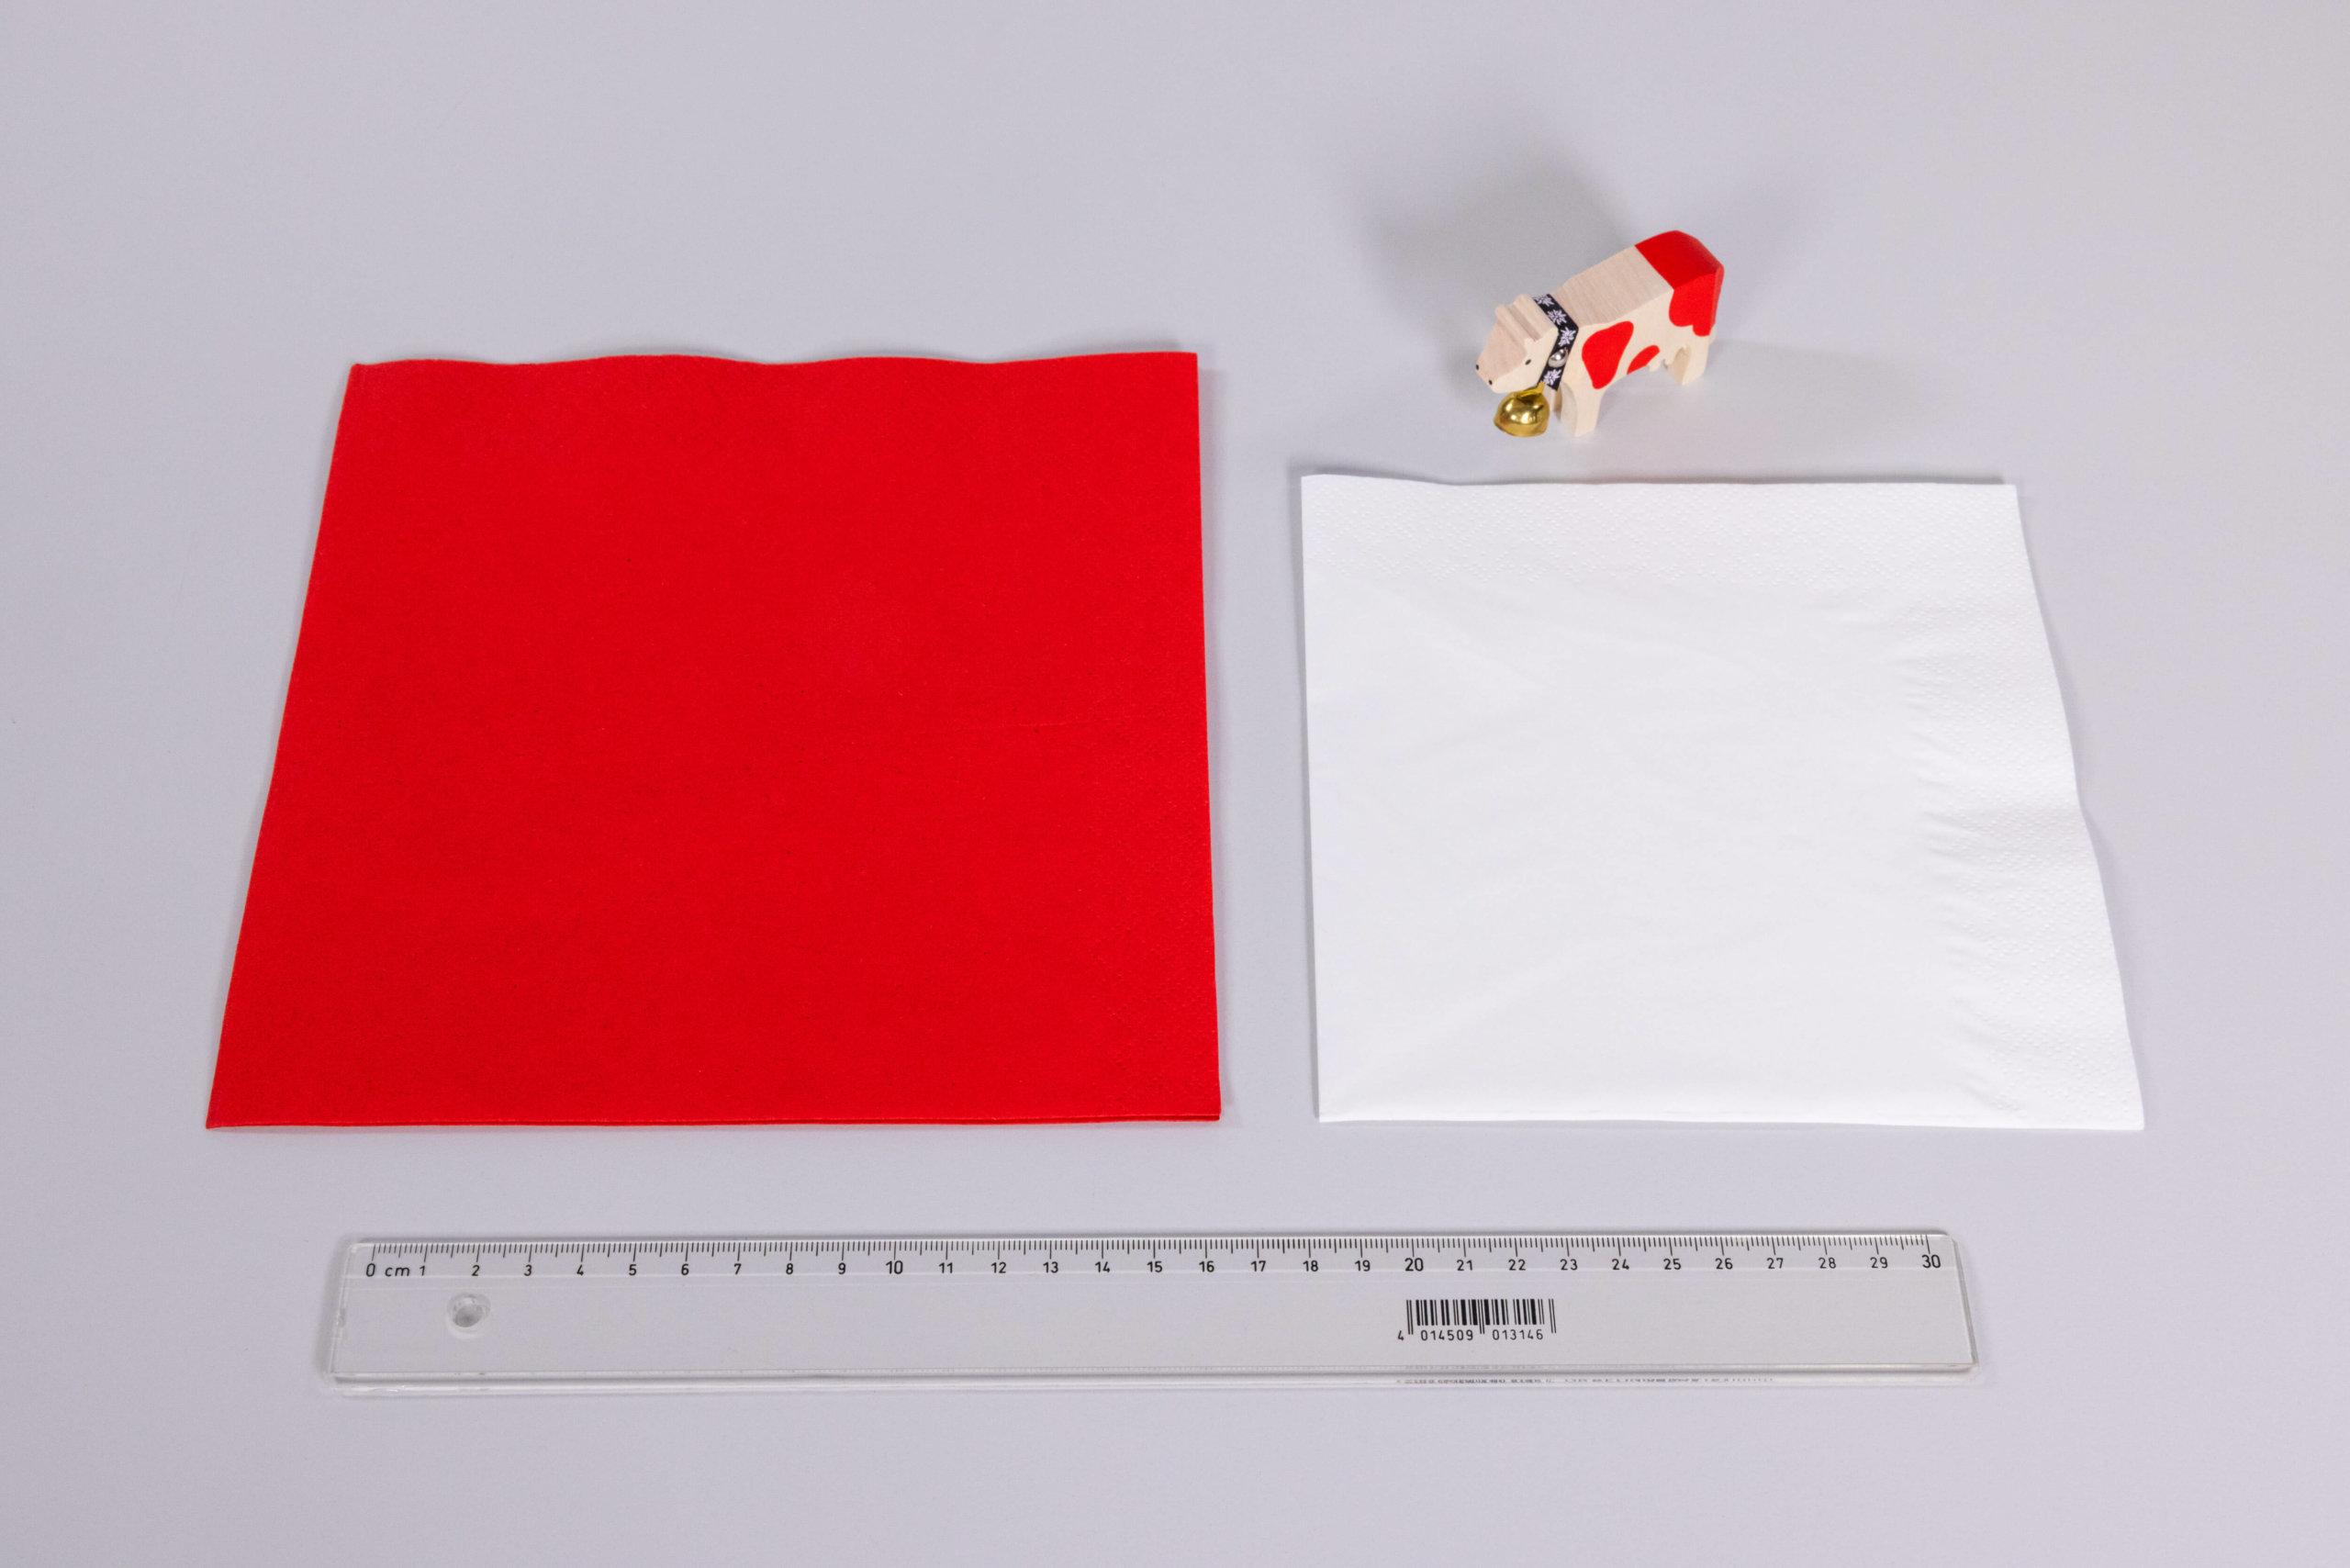 Napkin folding 1 August